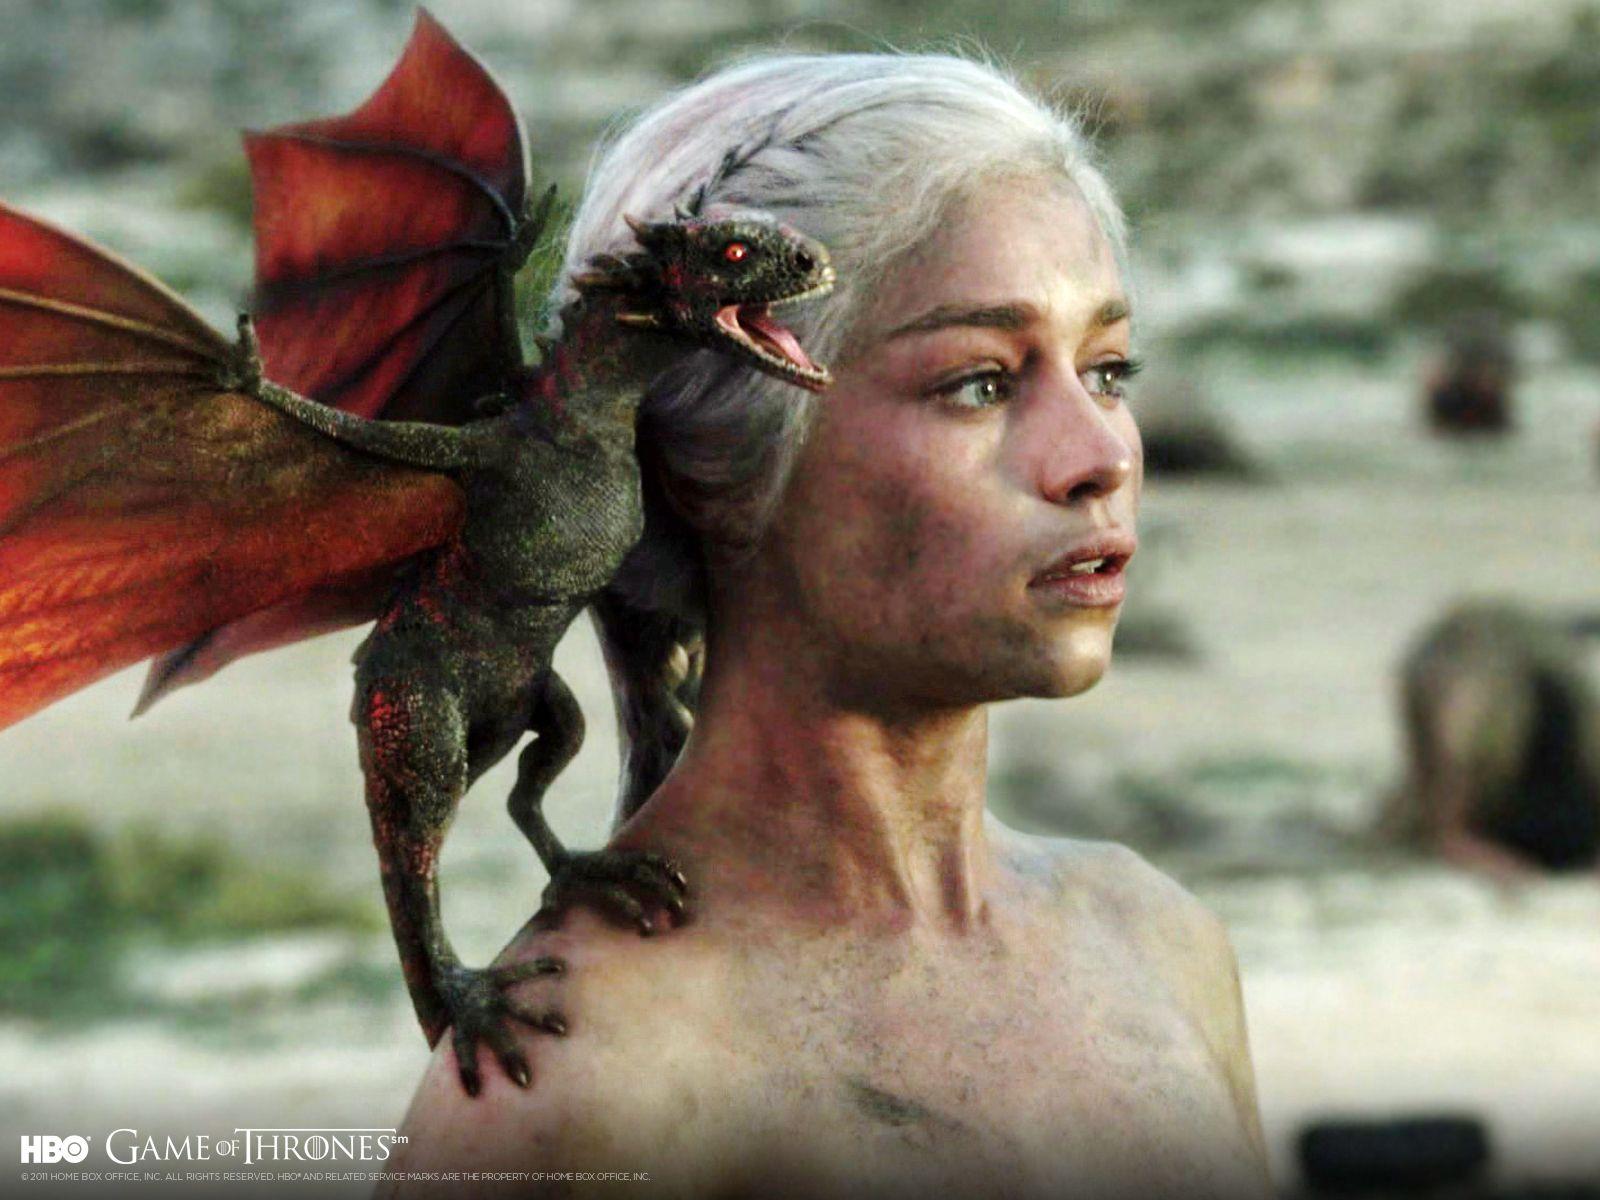 Mother of Dragons. #gameofthrones #daenerys #khaleesi #targaryen